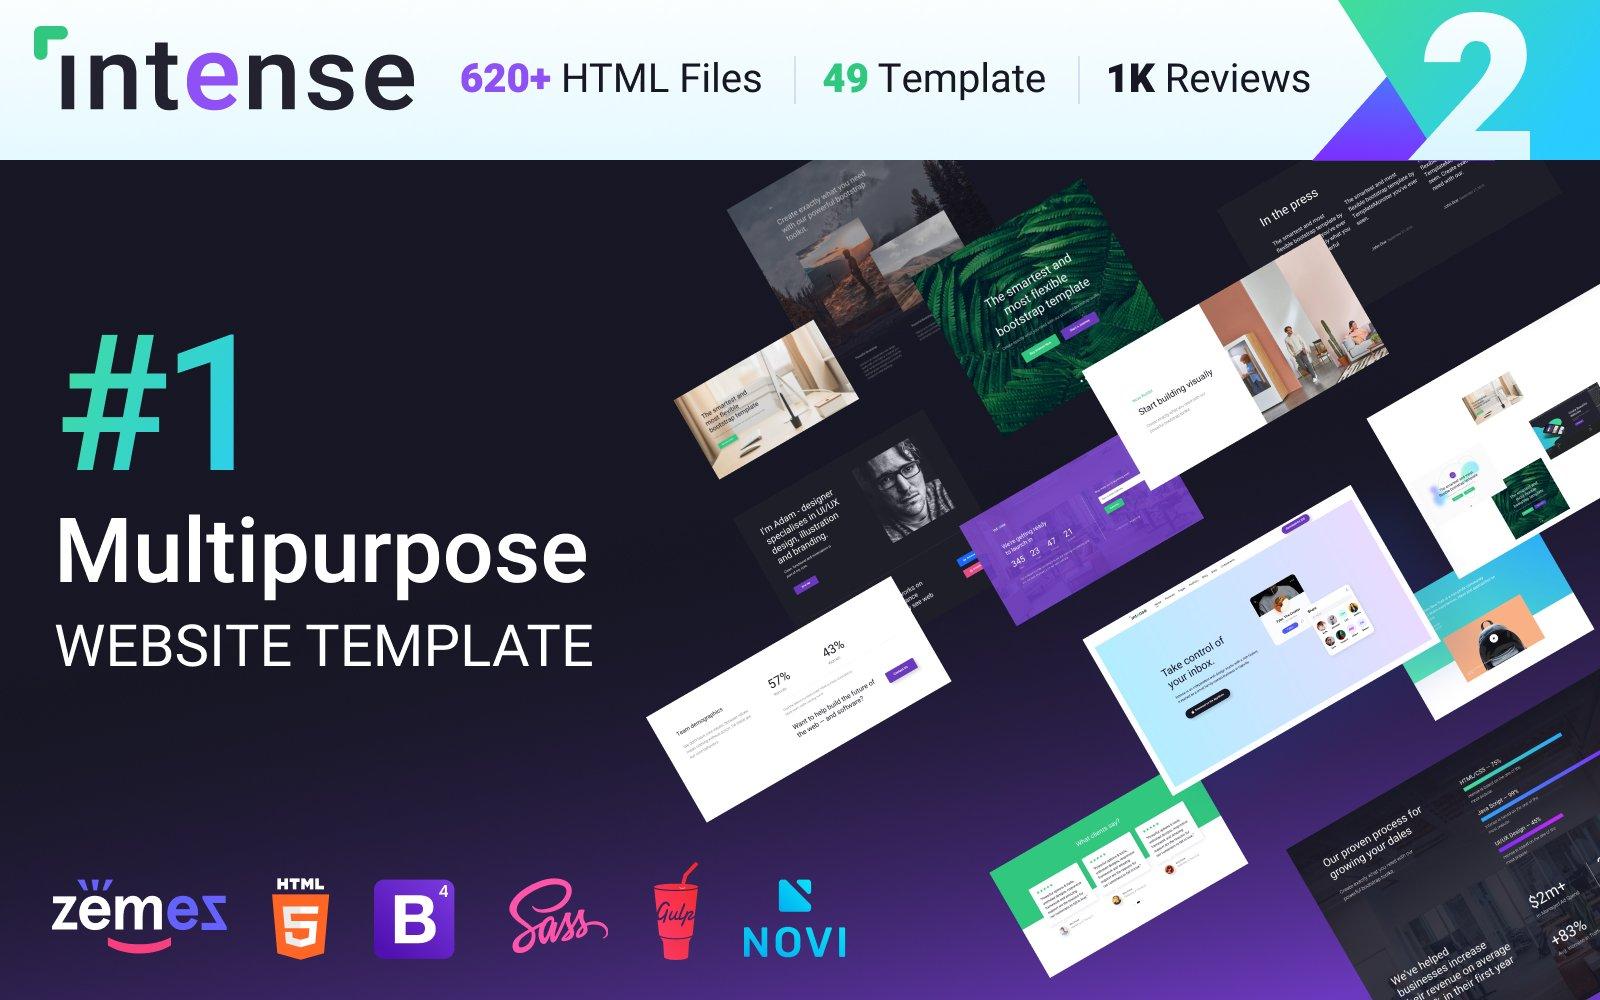 Multipurpose Website Template Intense - #1 HTML Bootstrap Template Web №58888